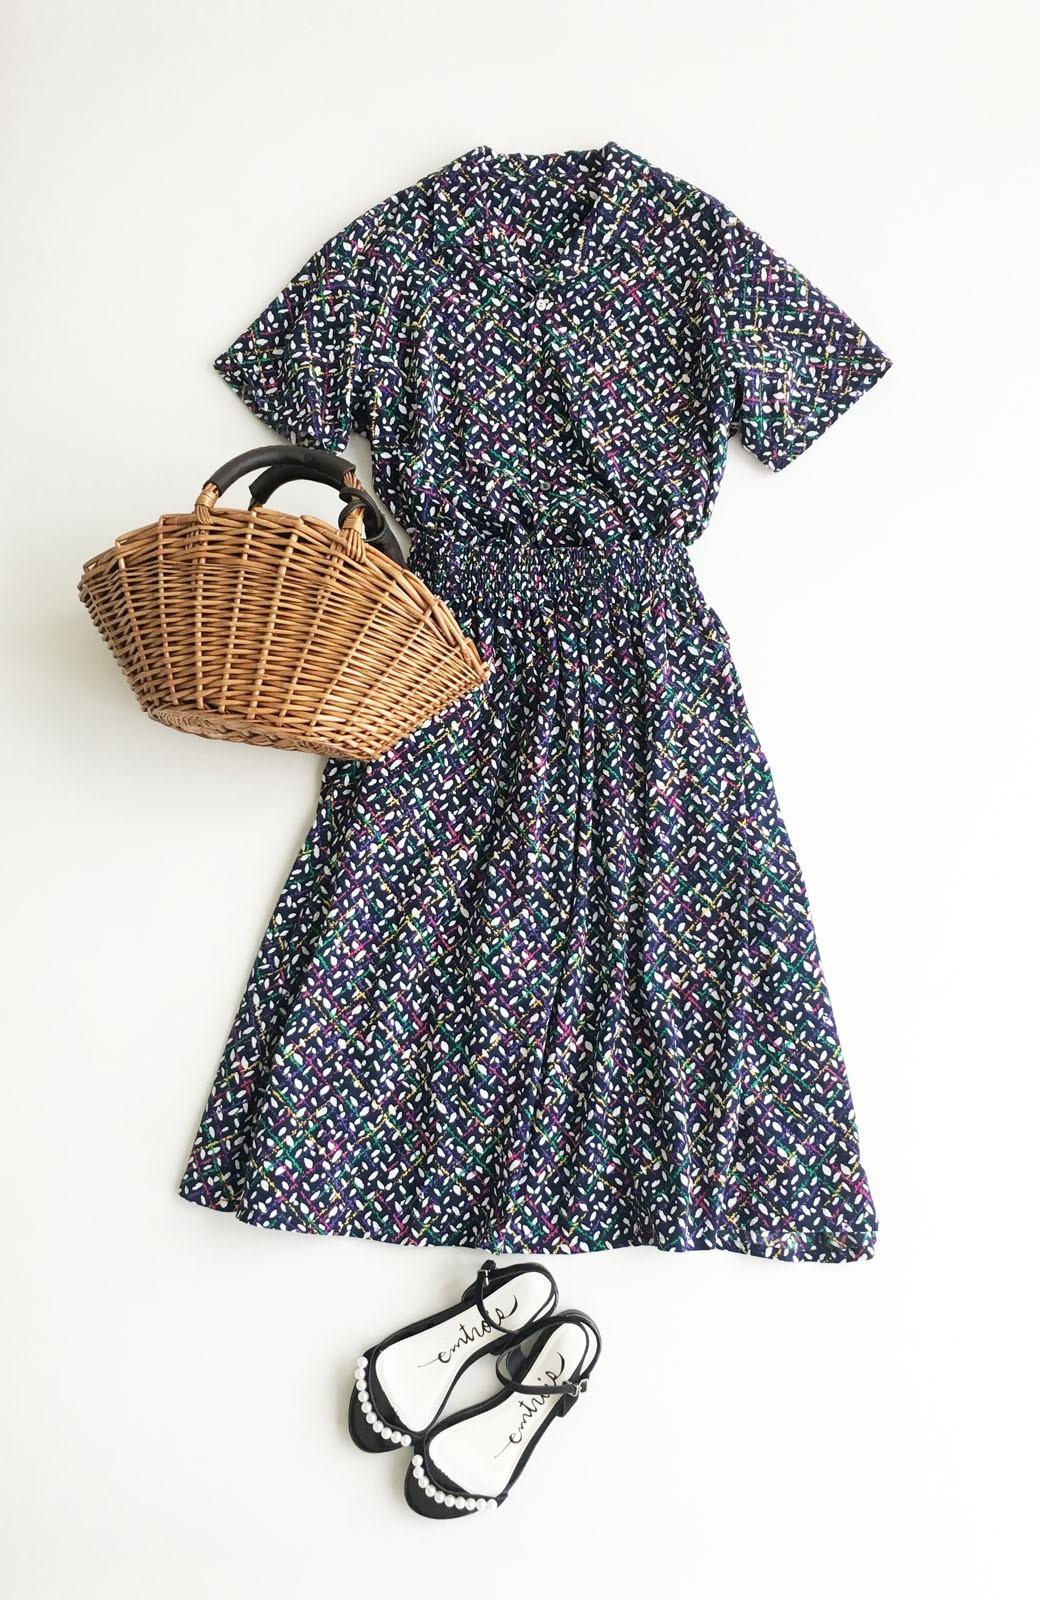 haco! 【今年も再販!】京都の浴衣屋さんと作った浴衣生地のシャツ <ネイビー>の商品写真2